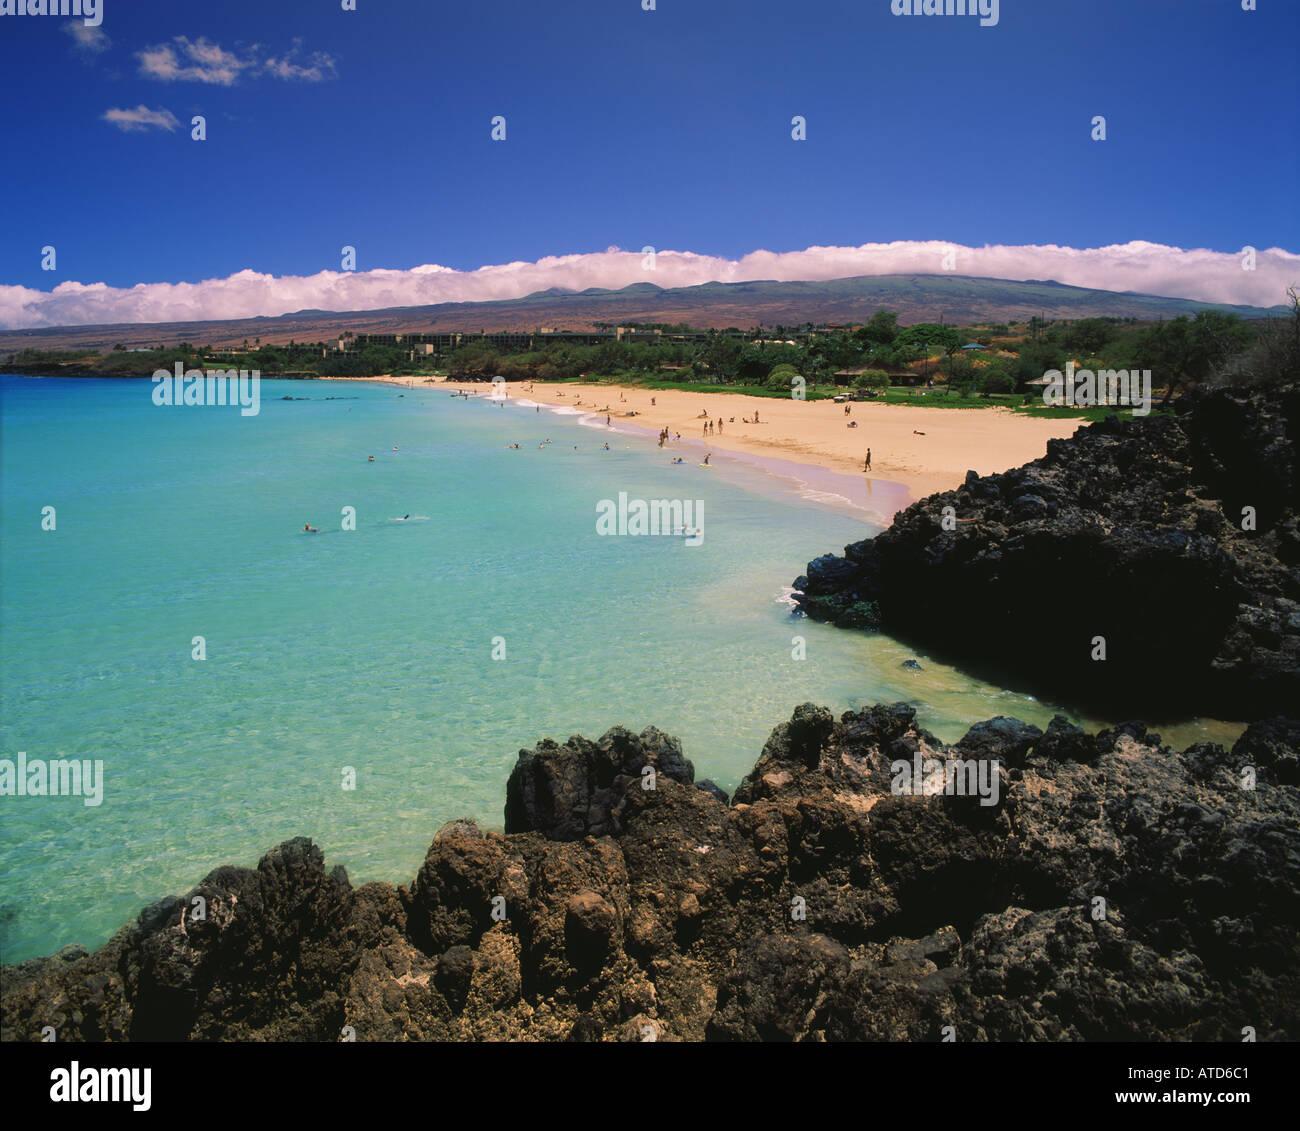 Big Island Beaches: Hapuna Beach State Park Kona Coast On The Big Island